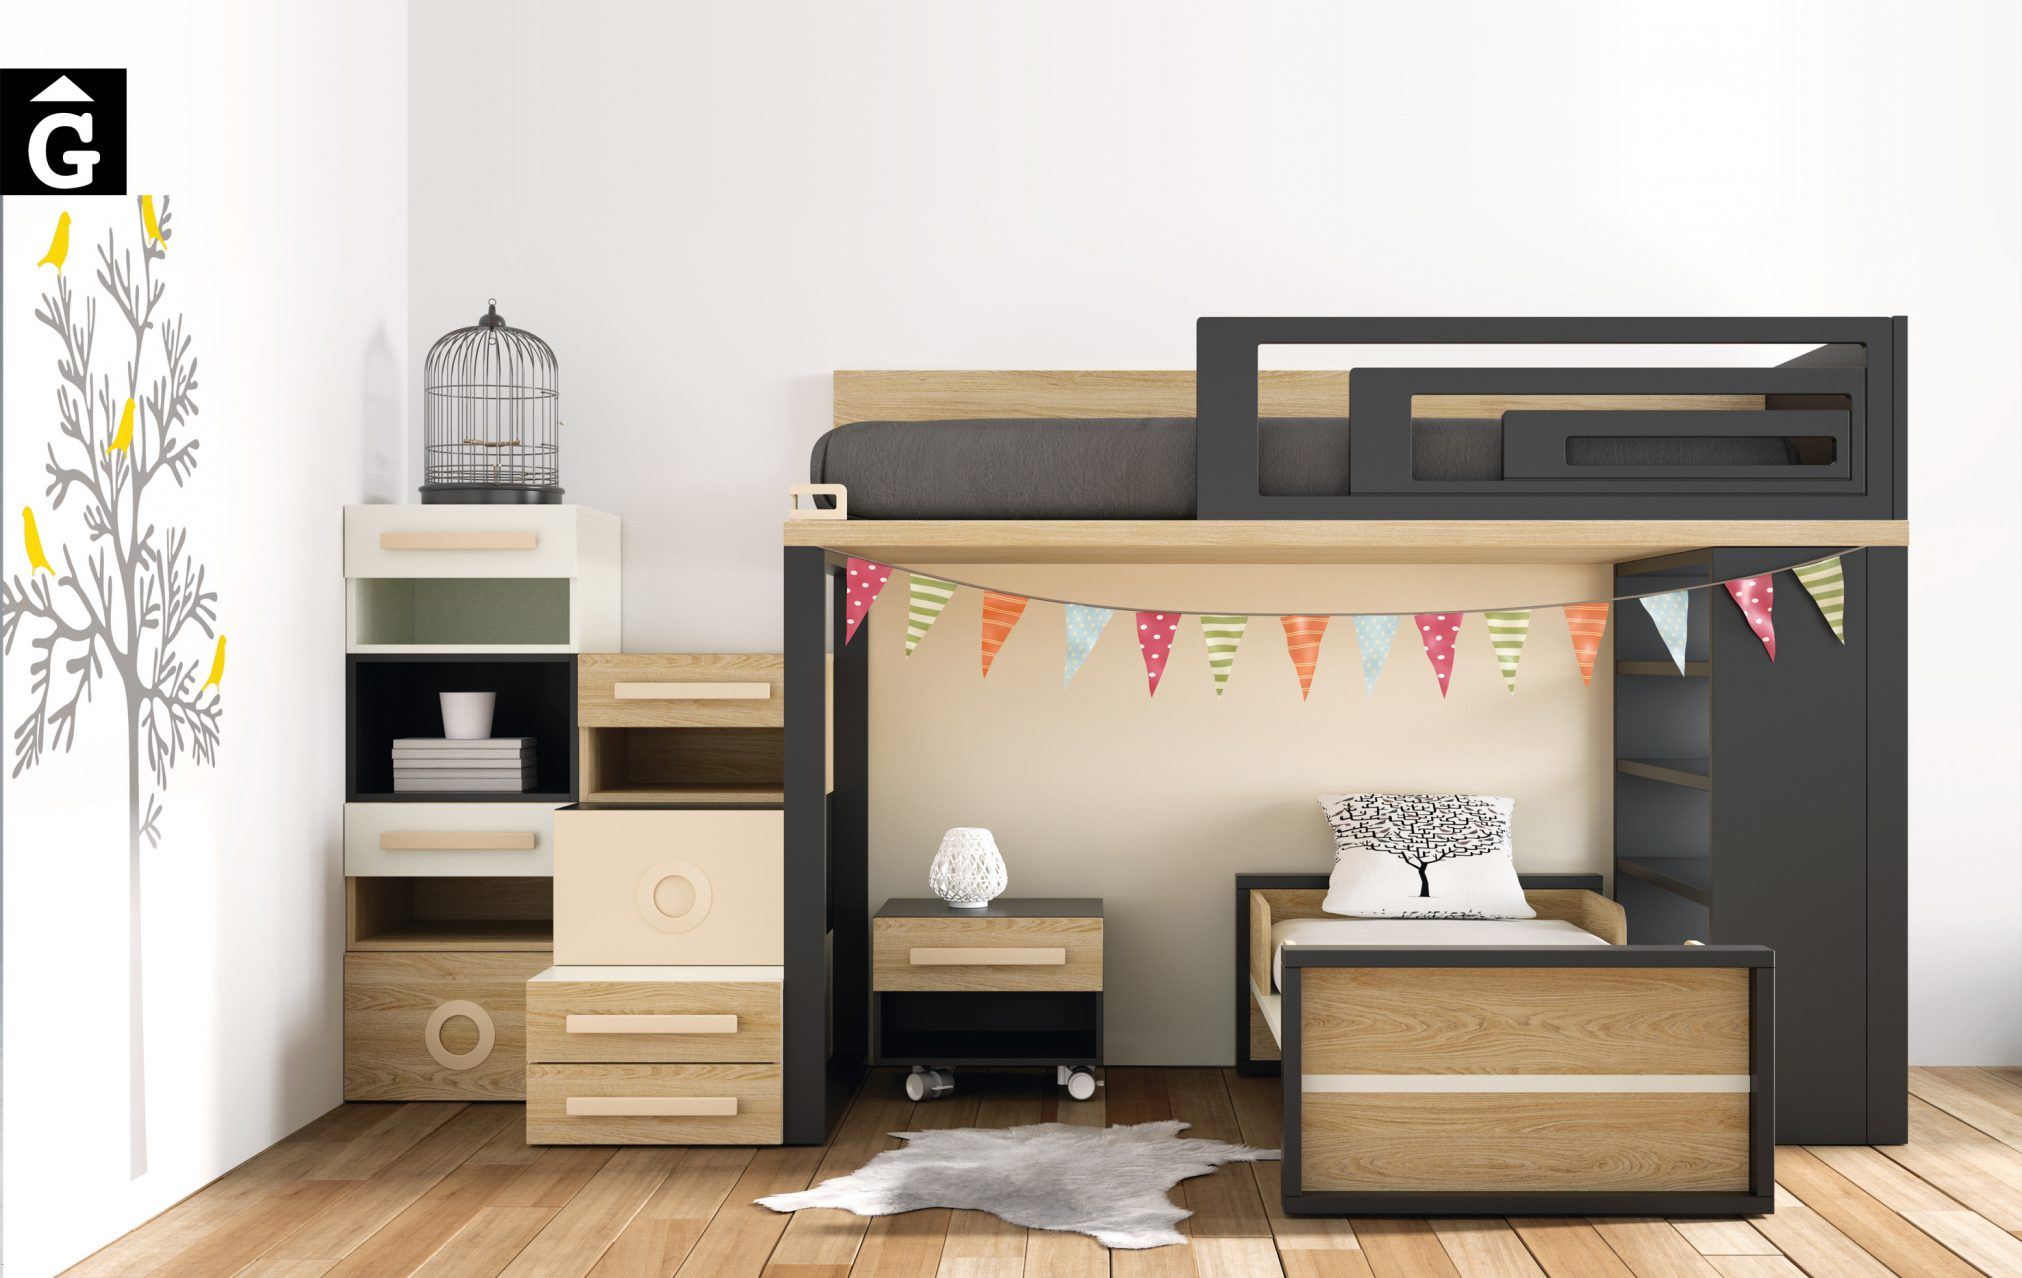 Lagrama llitera VIENA habitacions juvenils by mobles Gifreu Porqueres Girona